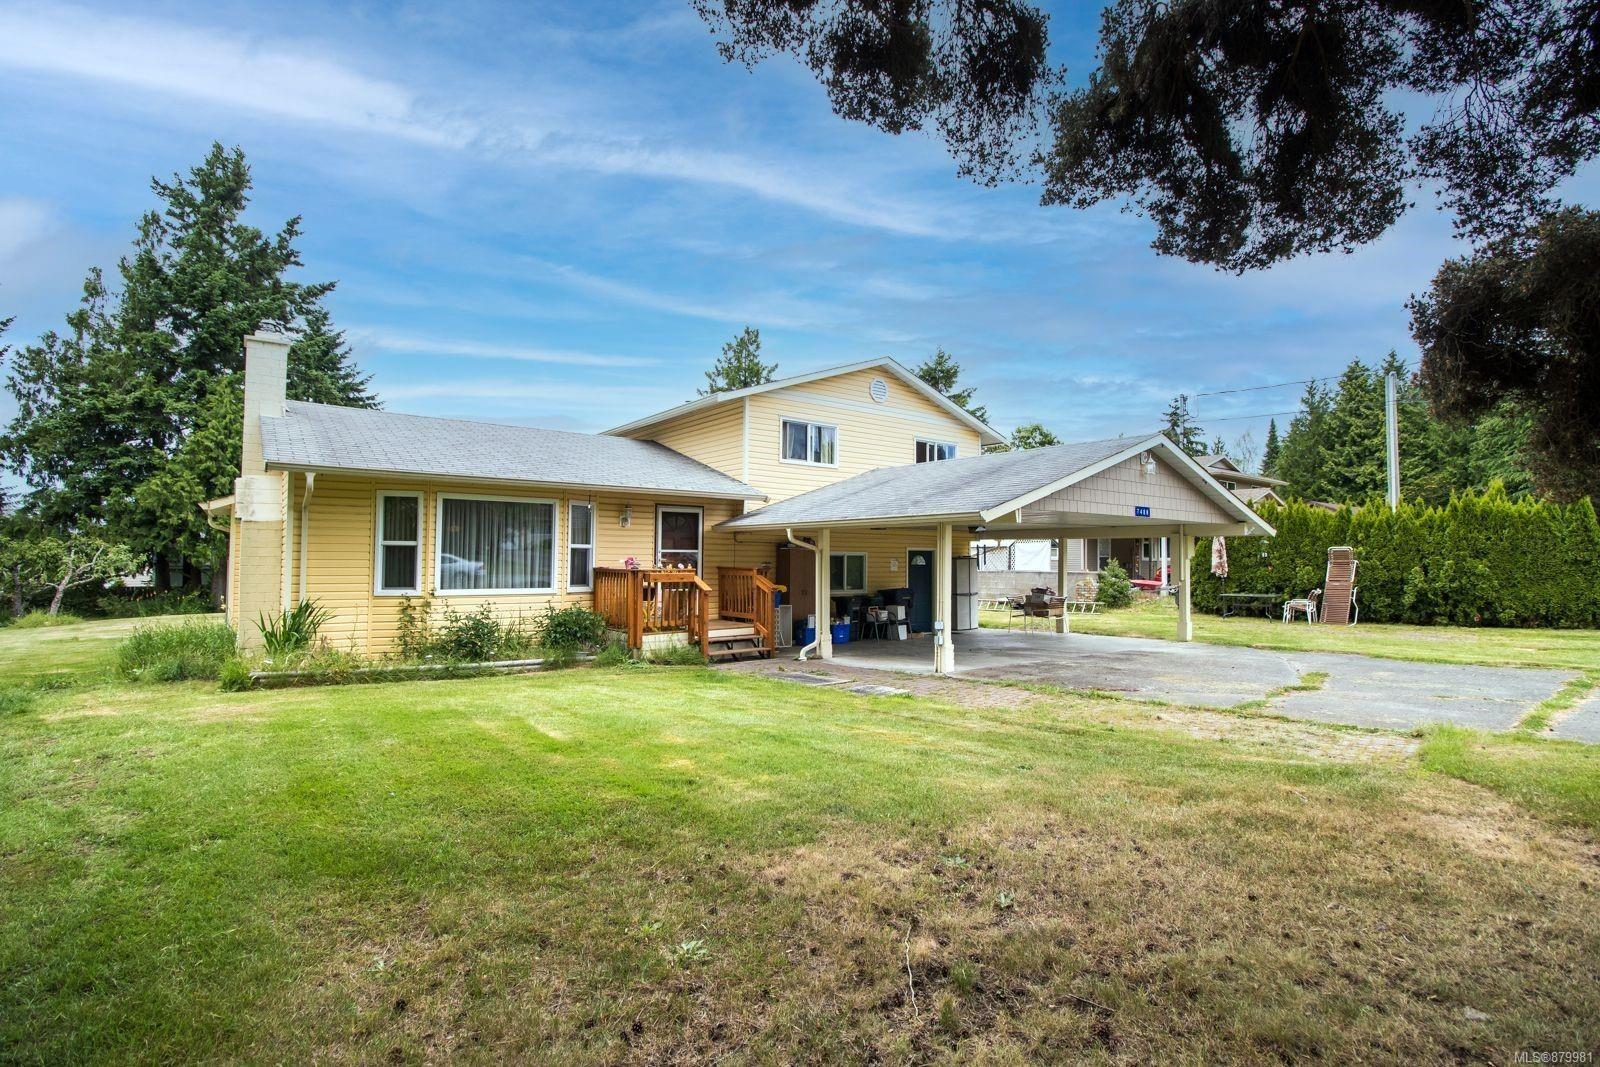 Main Photo: 7488 Elizabeth Way in : Na Upper Lantzville House for sale (Nanaimo)  : MLS®# 879981